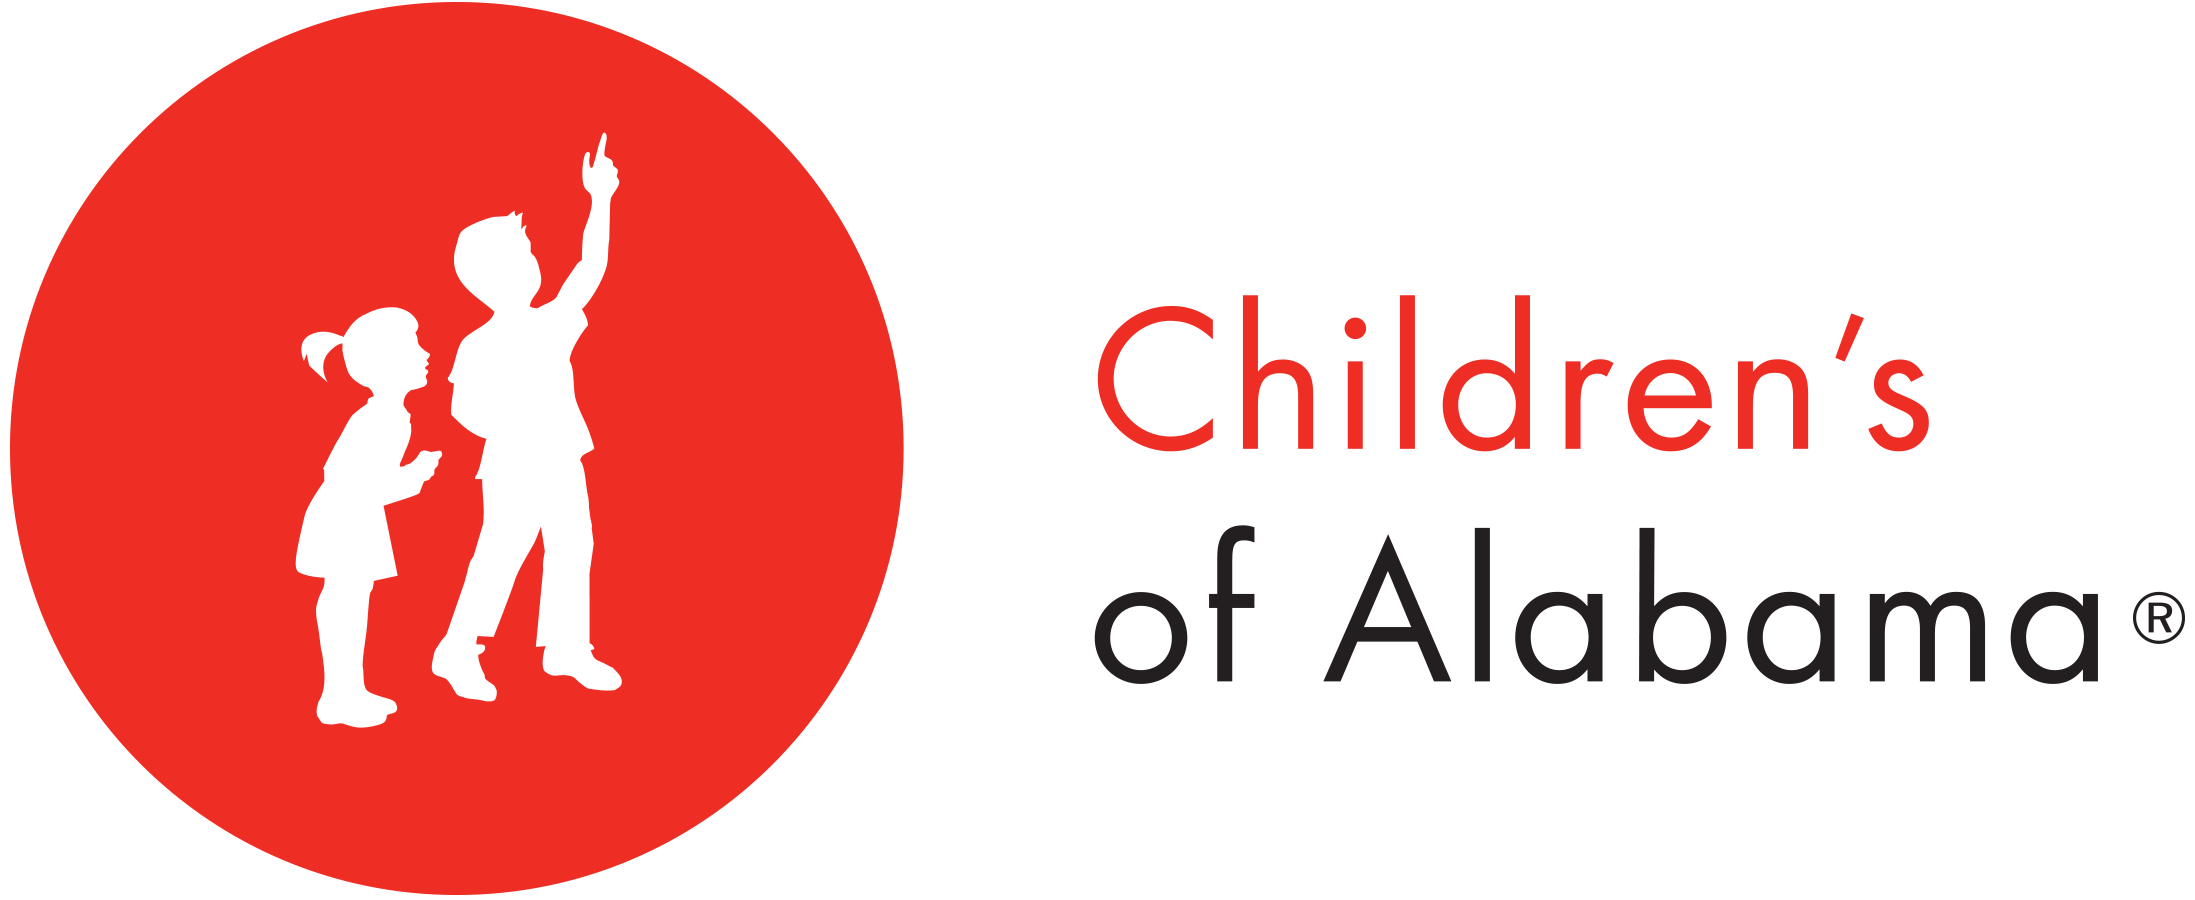 Childrens of Alabama